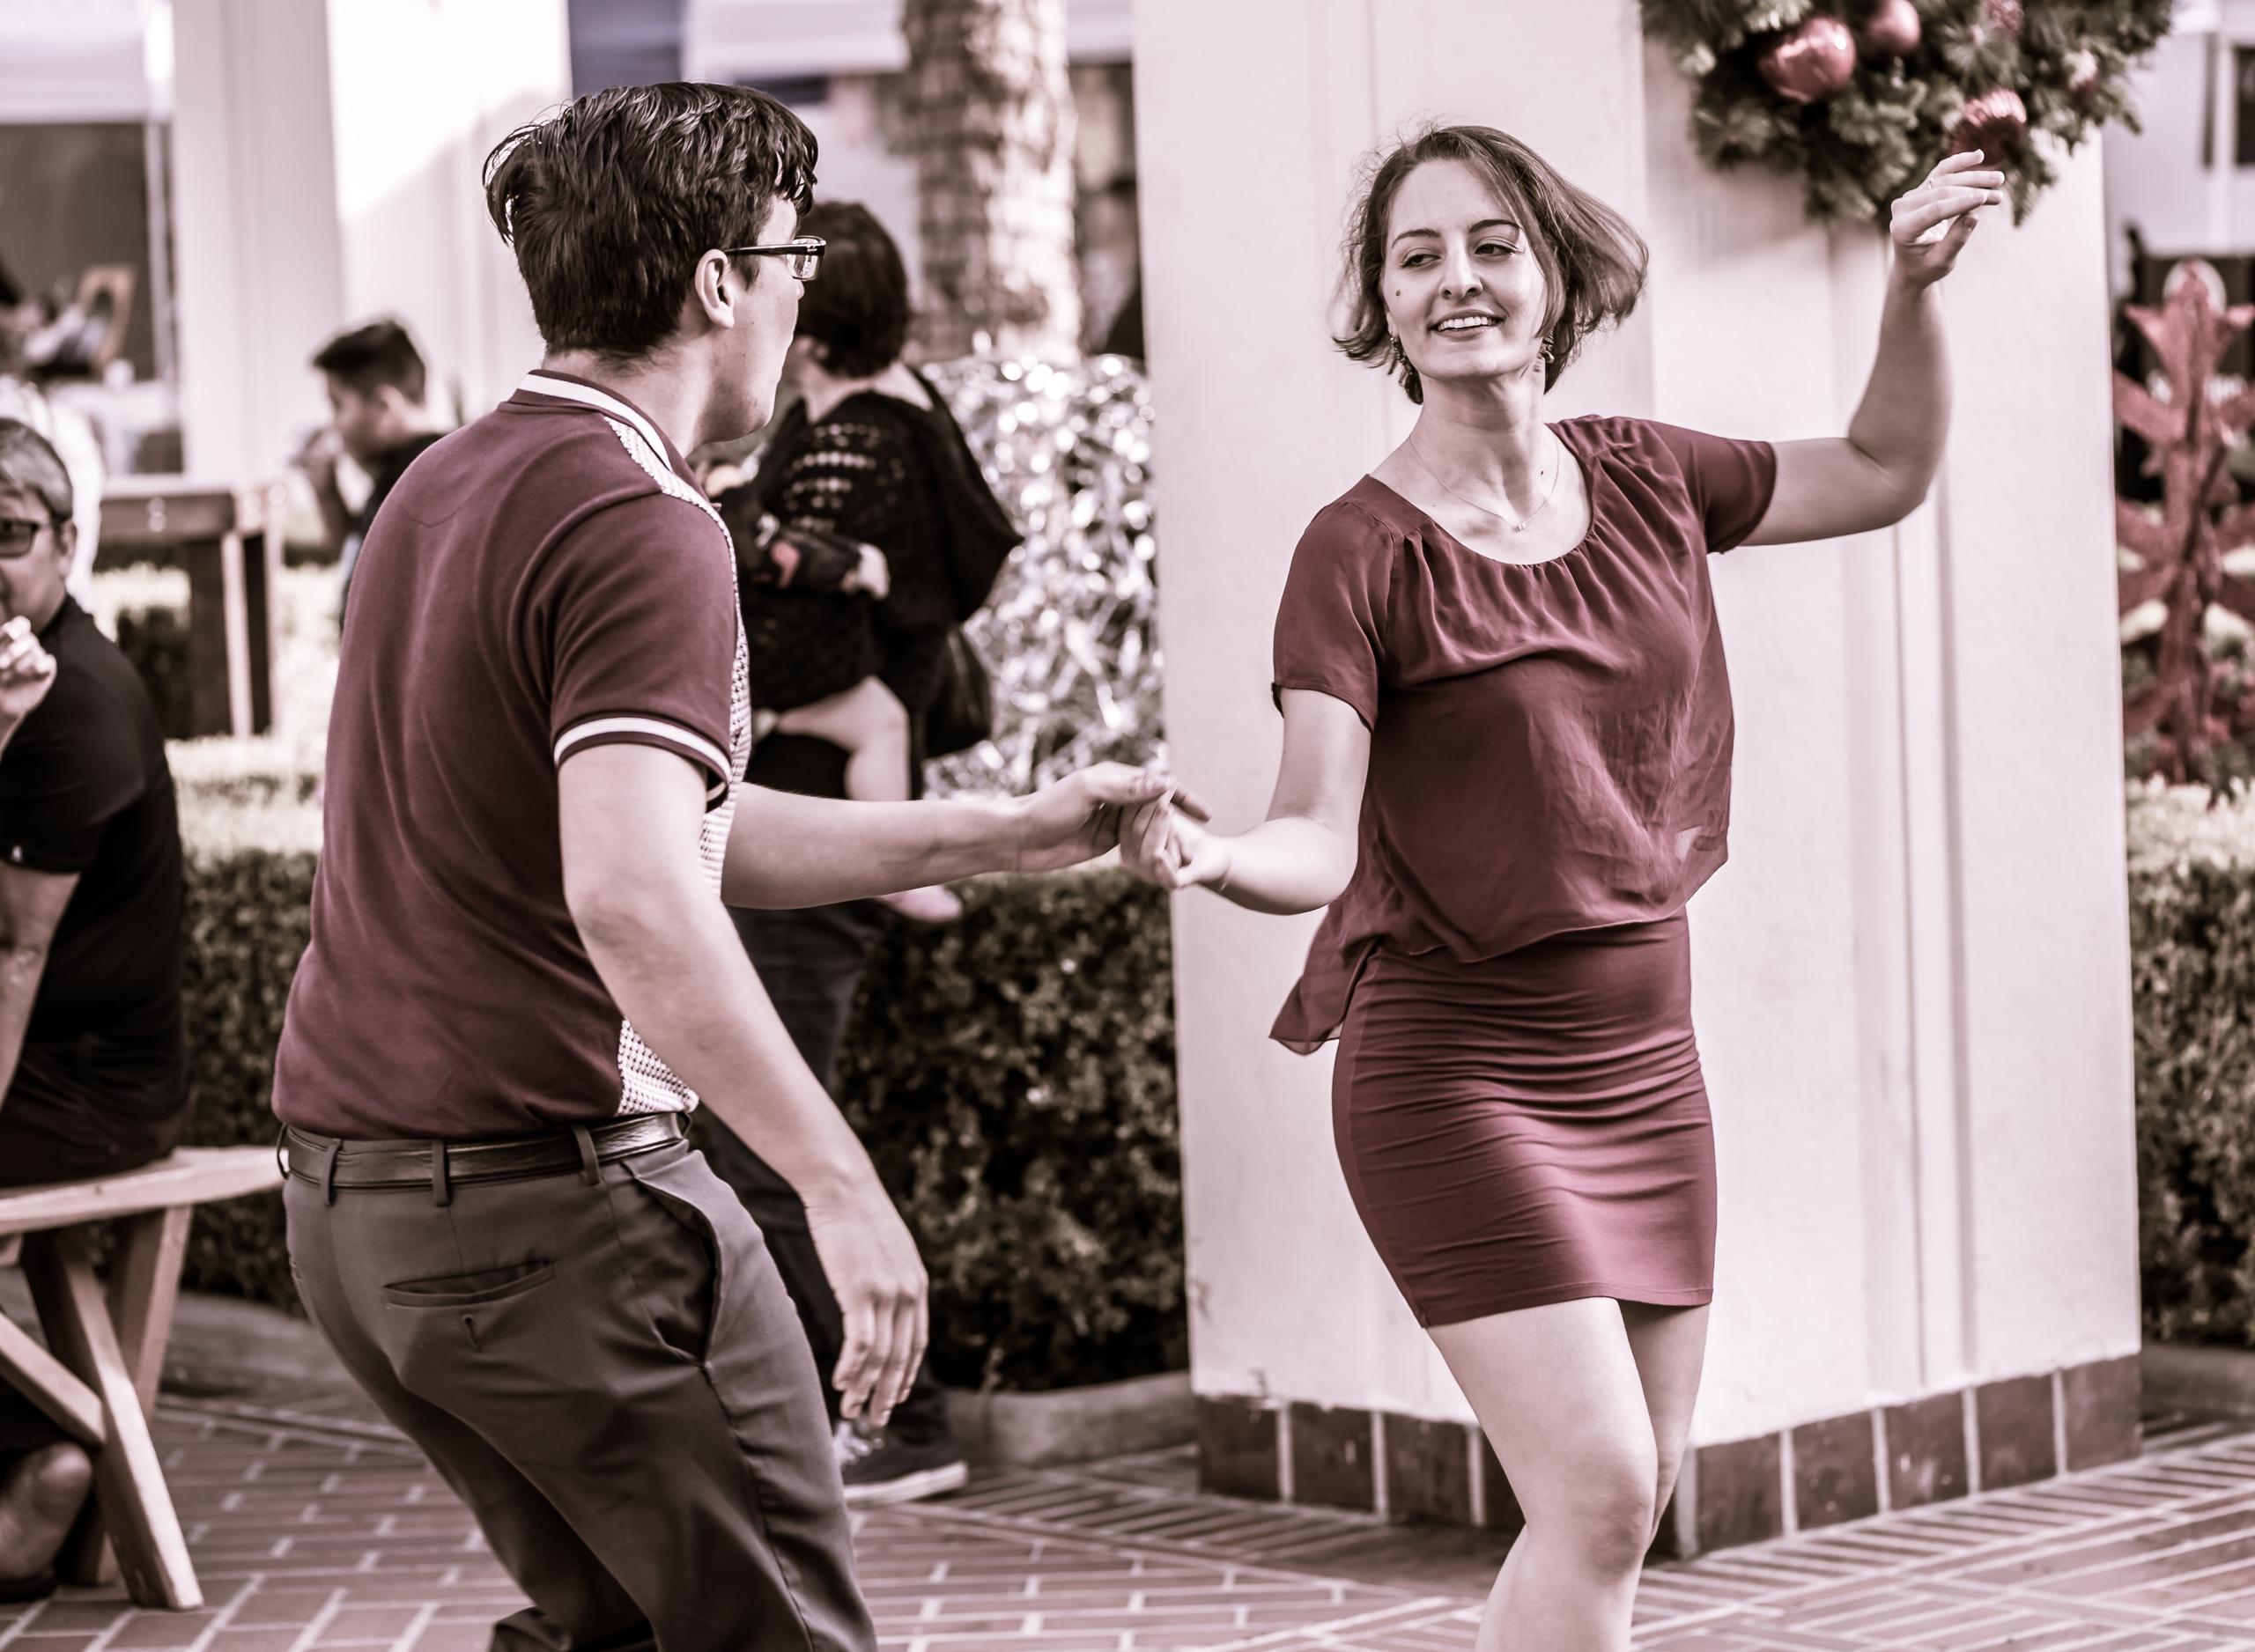 a couple dancing in an open-air courtyard